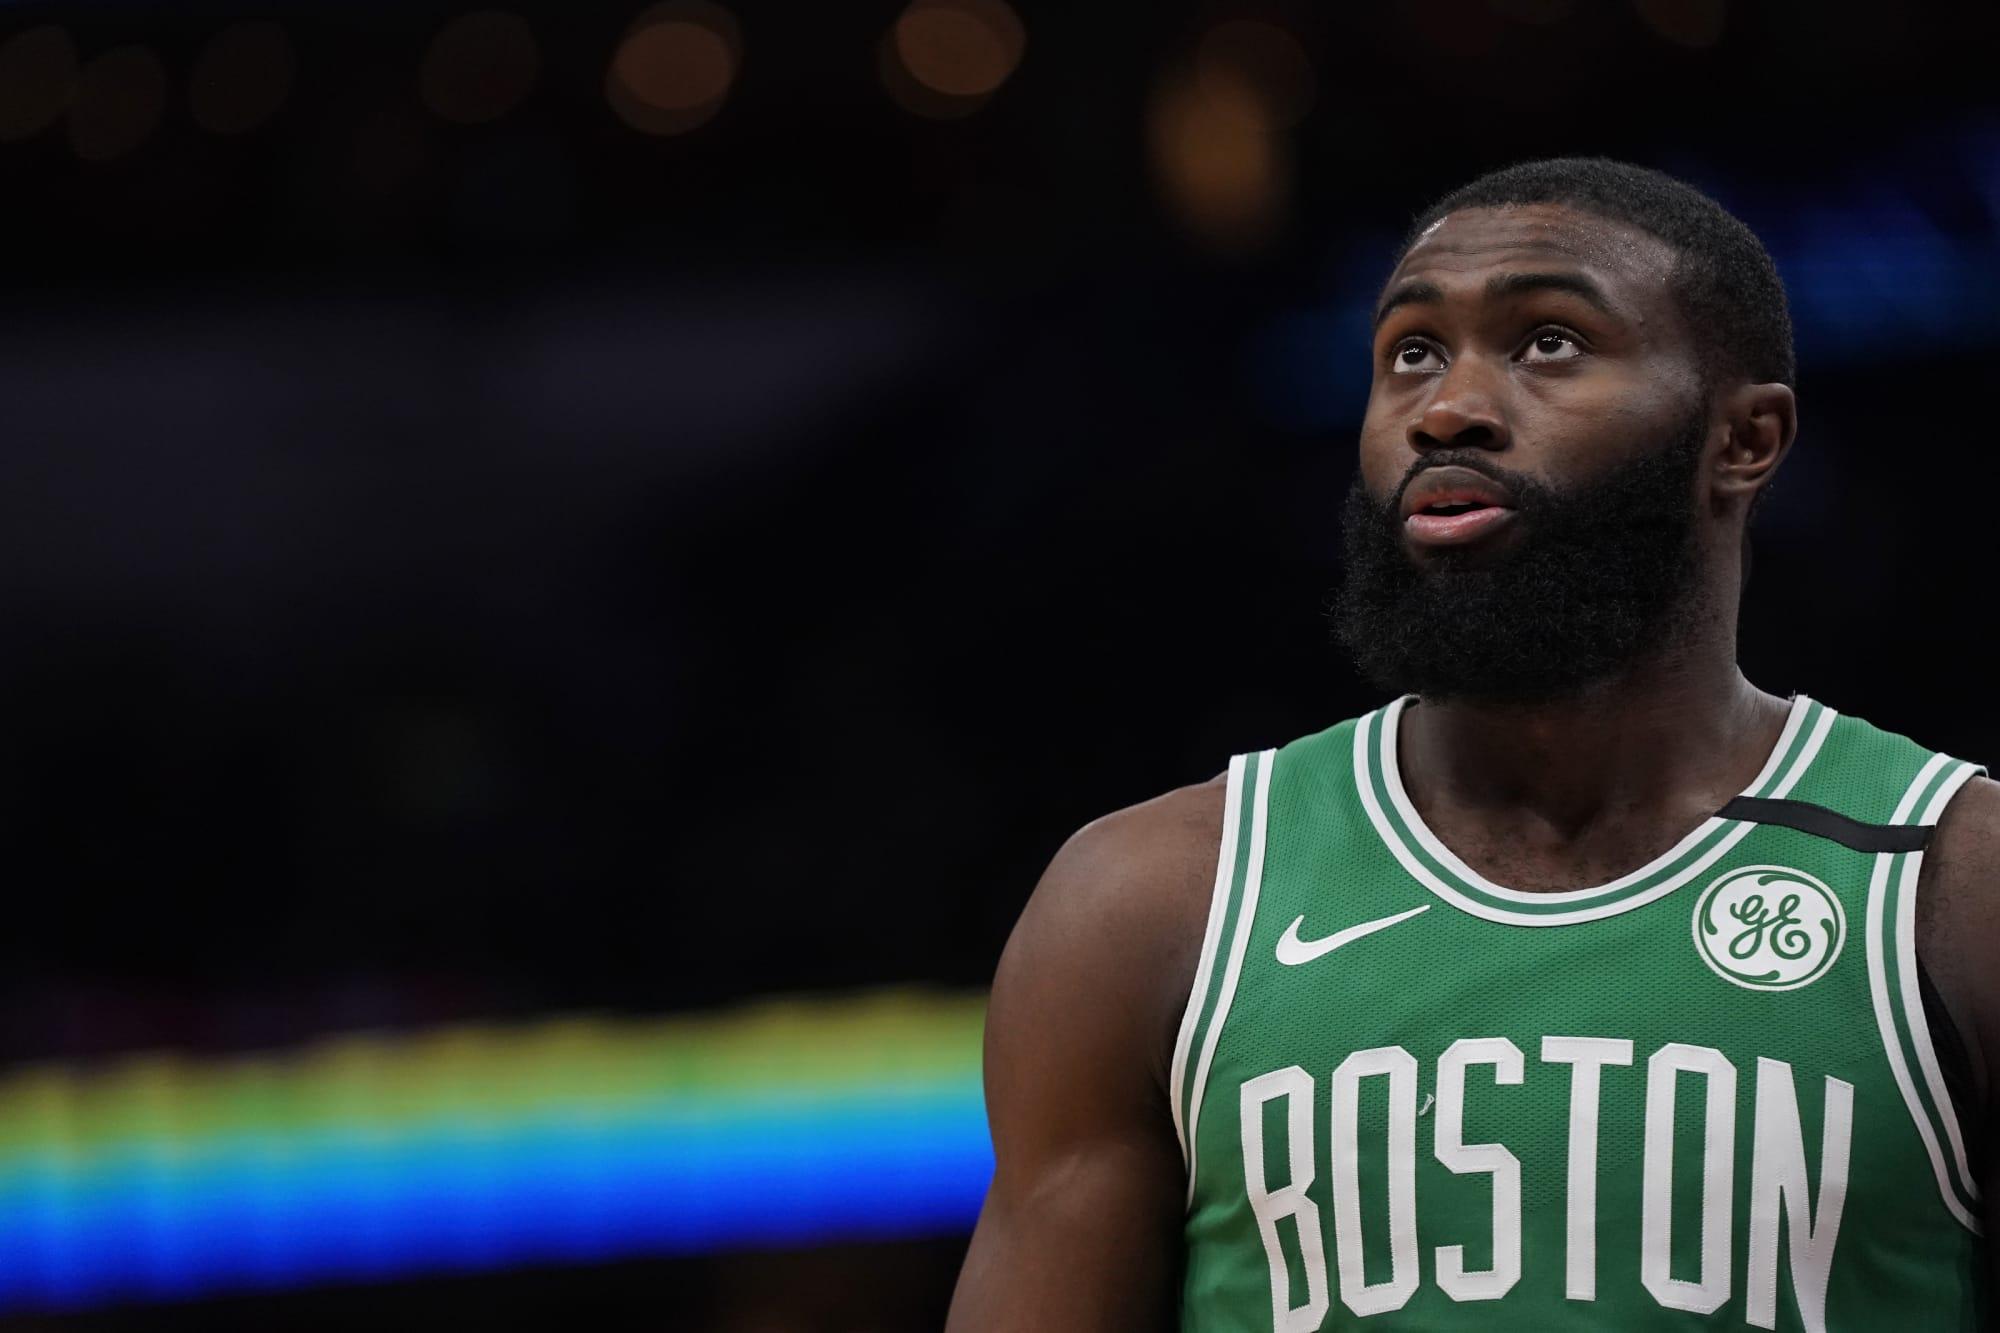 Boston Celtics: Breaking down what Jaylen Brown's injury means for Cs